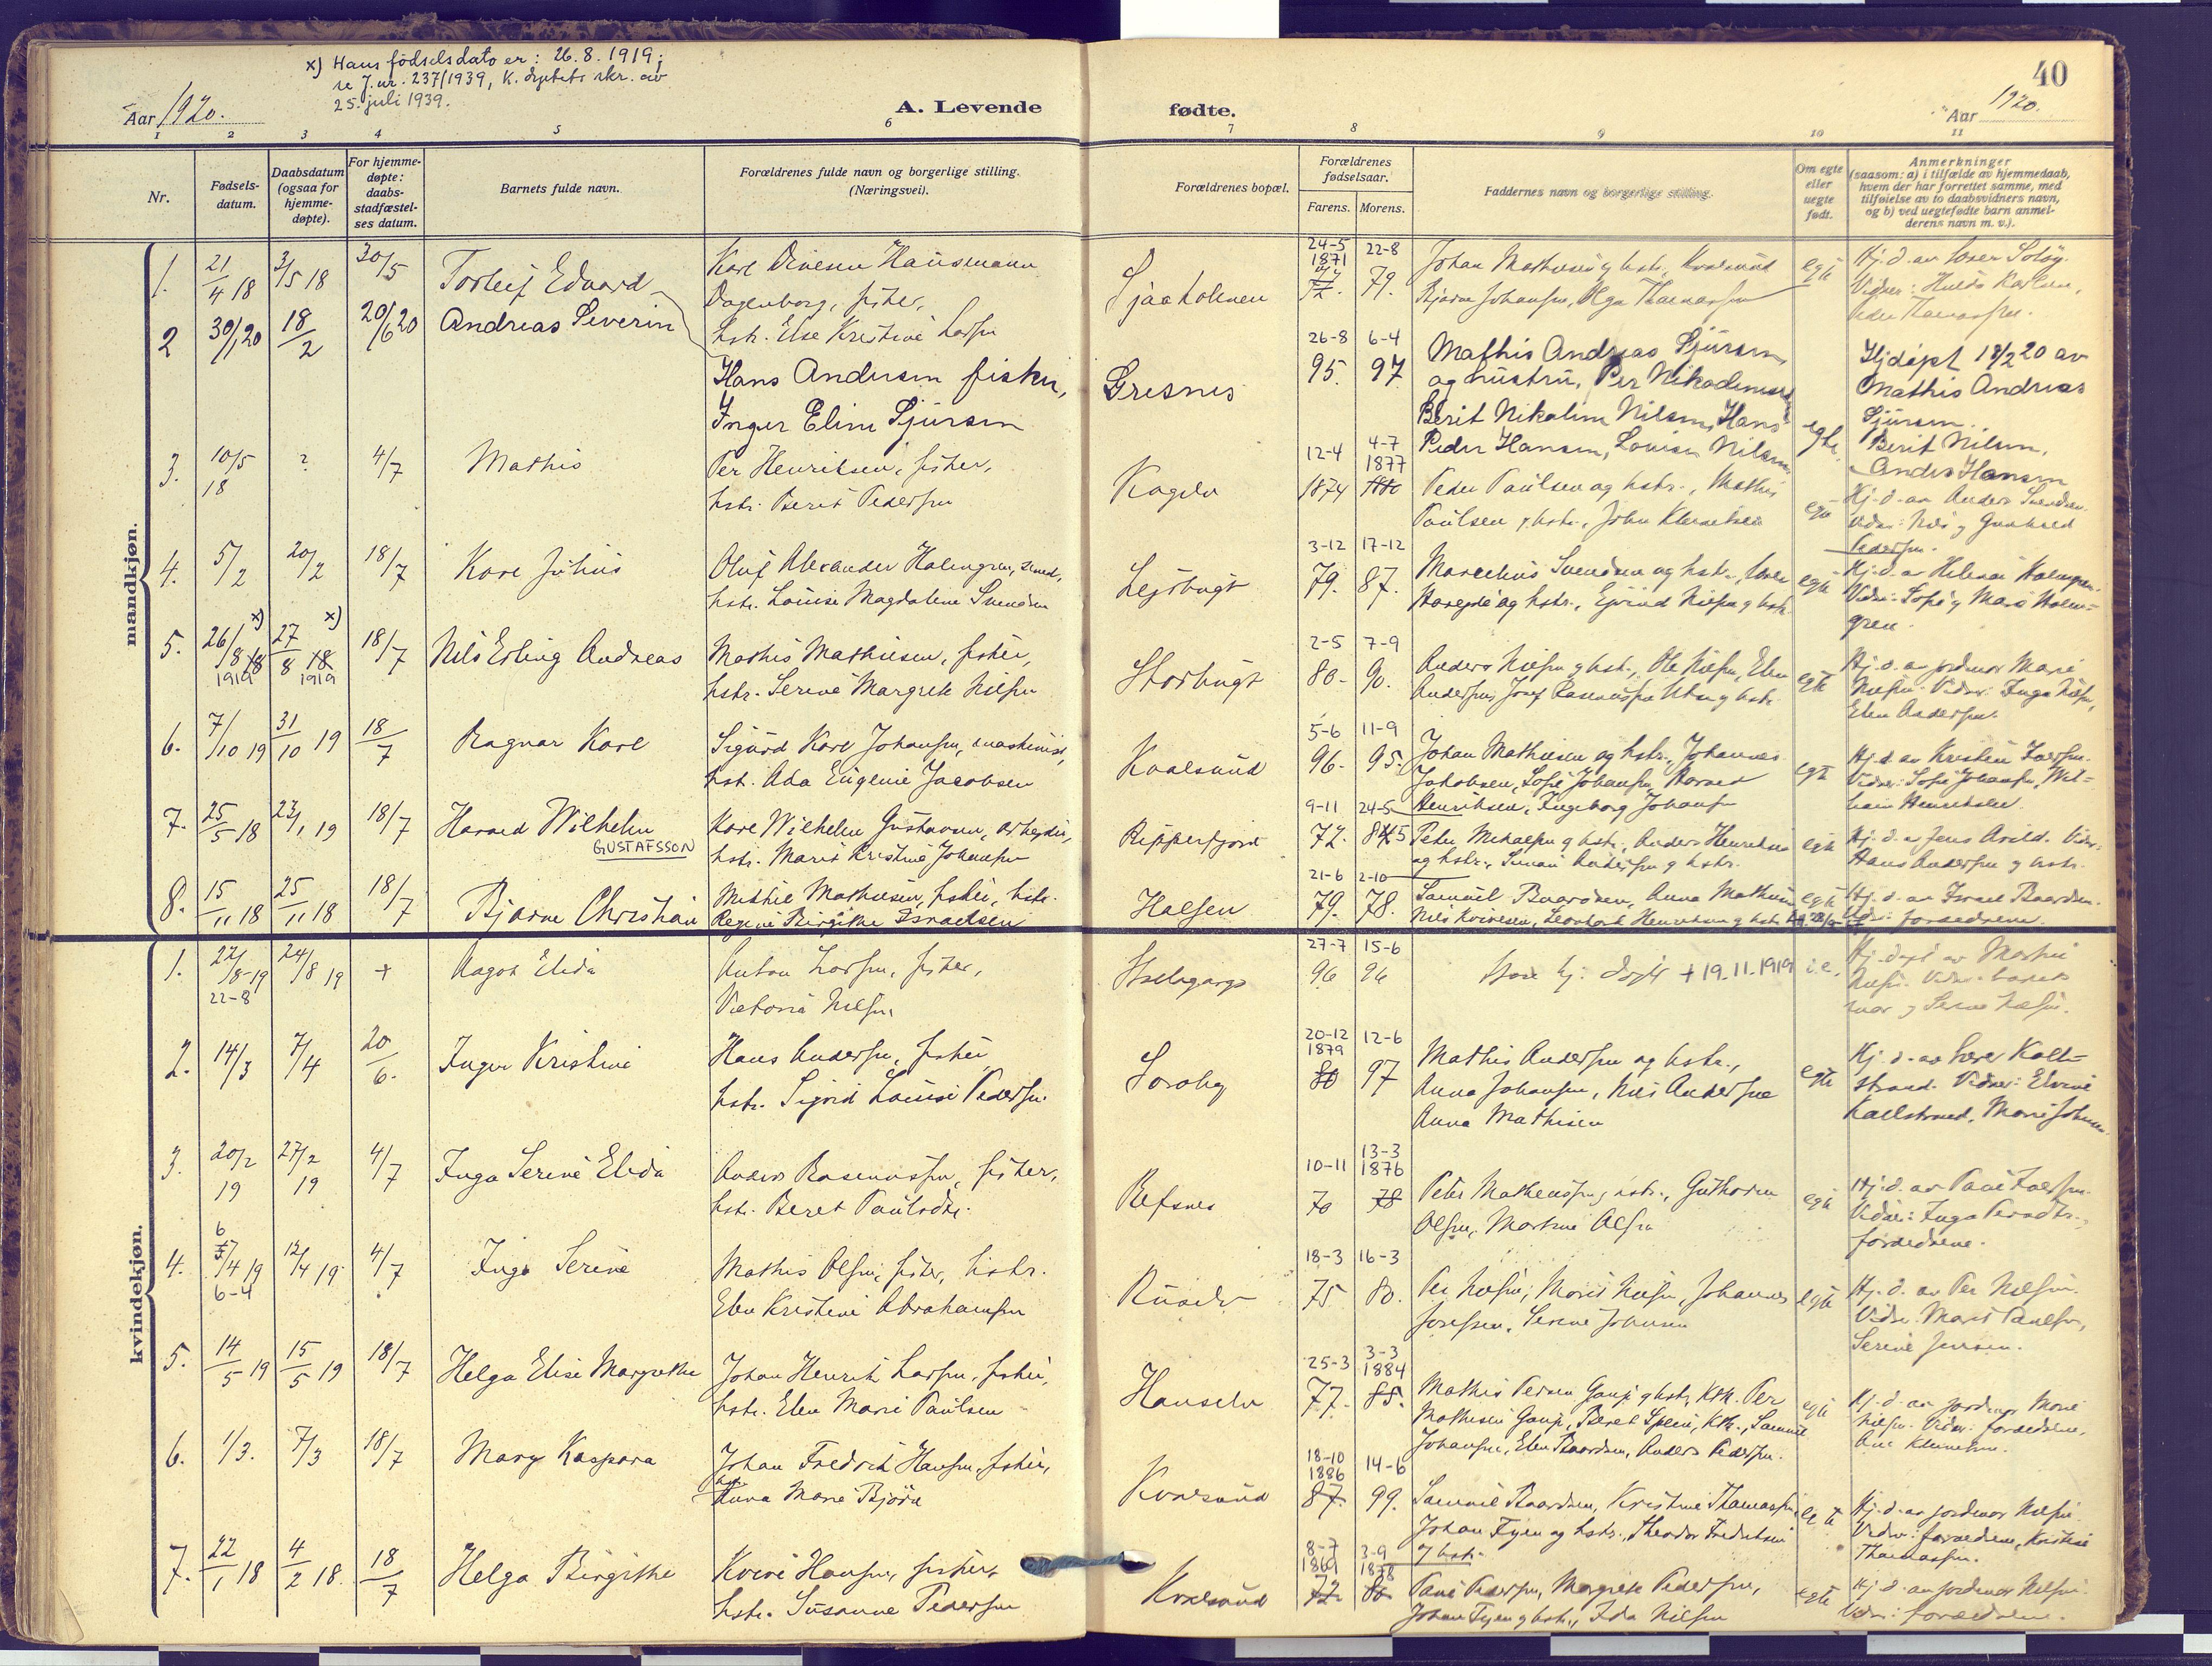 SATØ, Hammerfest sokneprestembete, Ministerialbok nr. 16, 1908-1923, s. 40